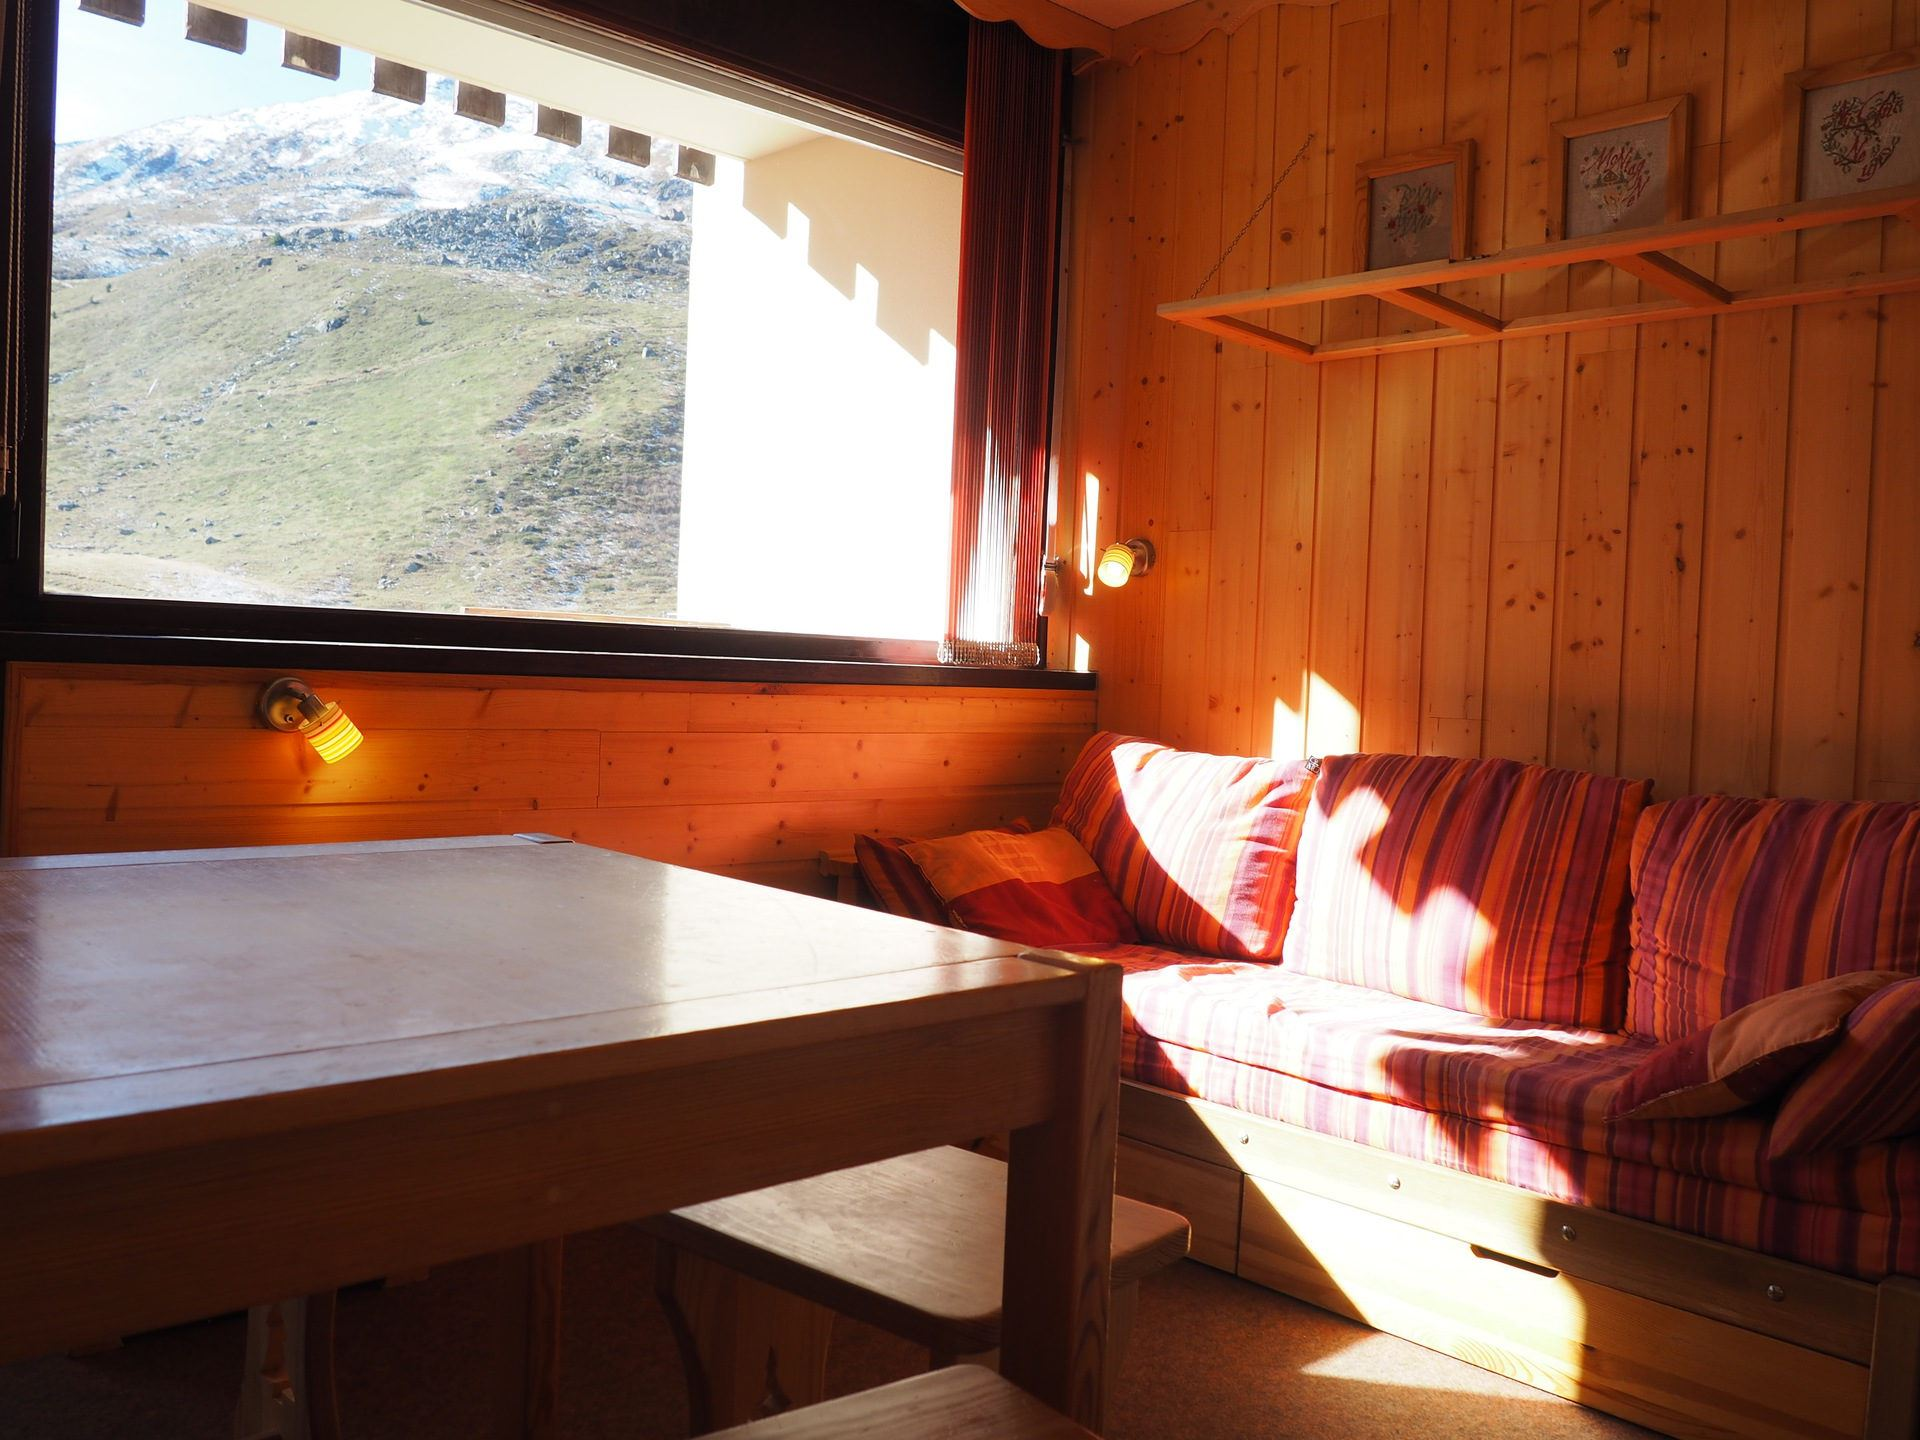 Studio cabine 4 Pers, 150m des pistes / ASTERS A1 329